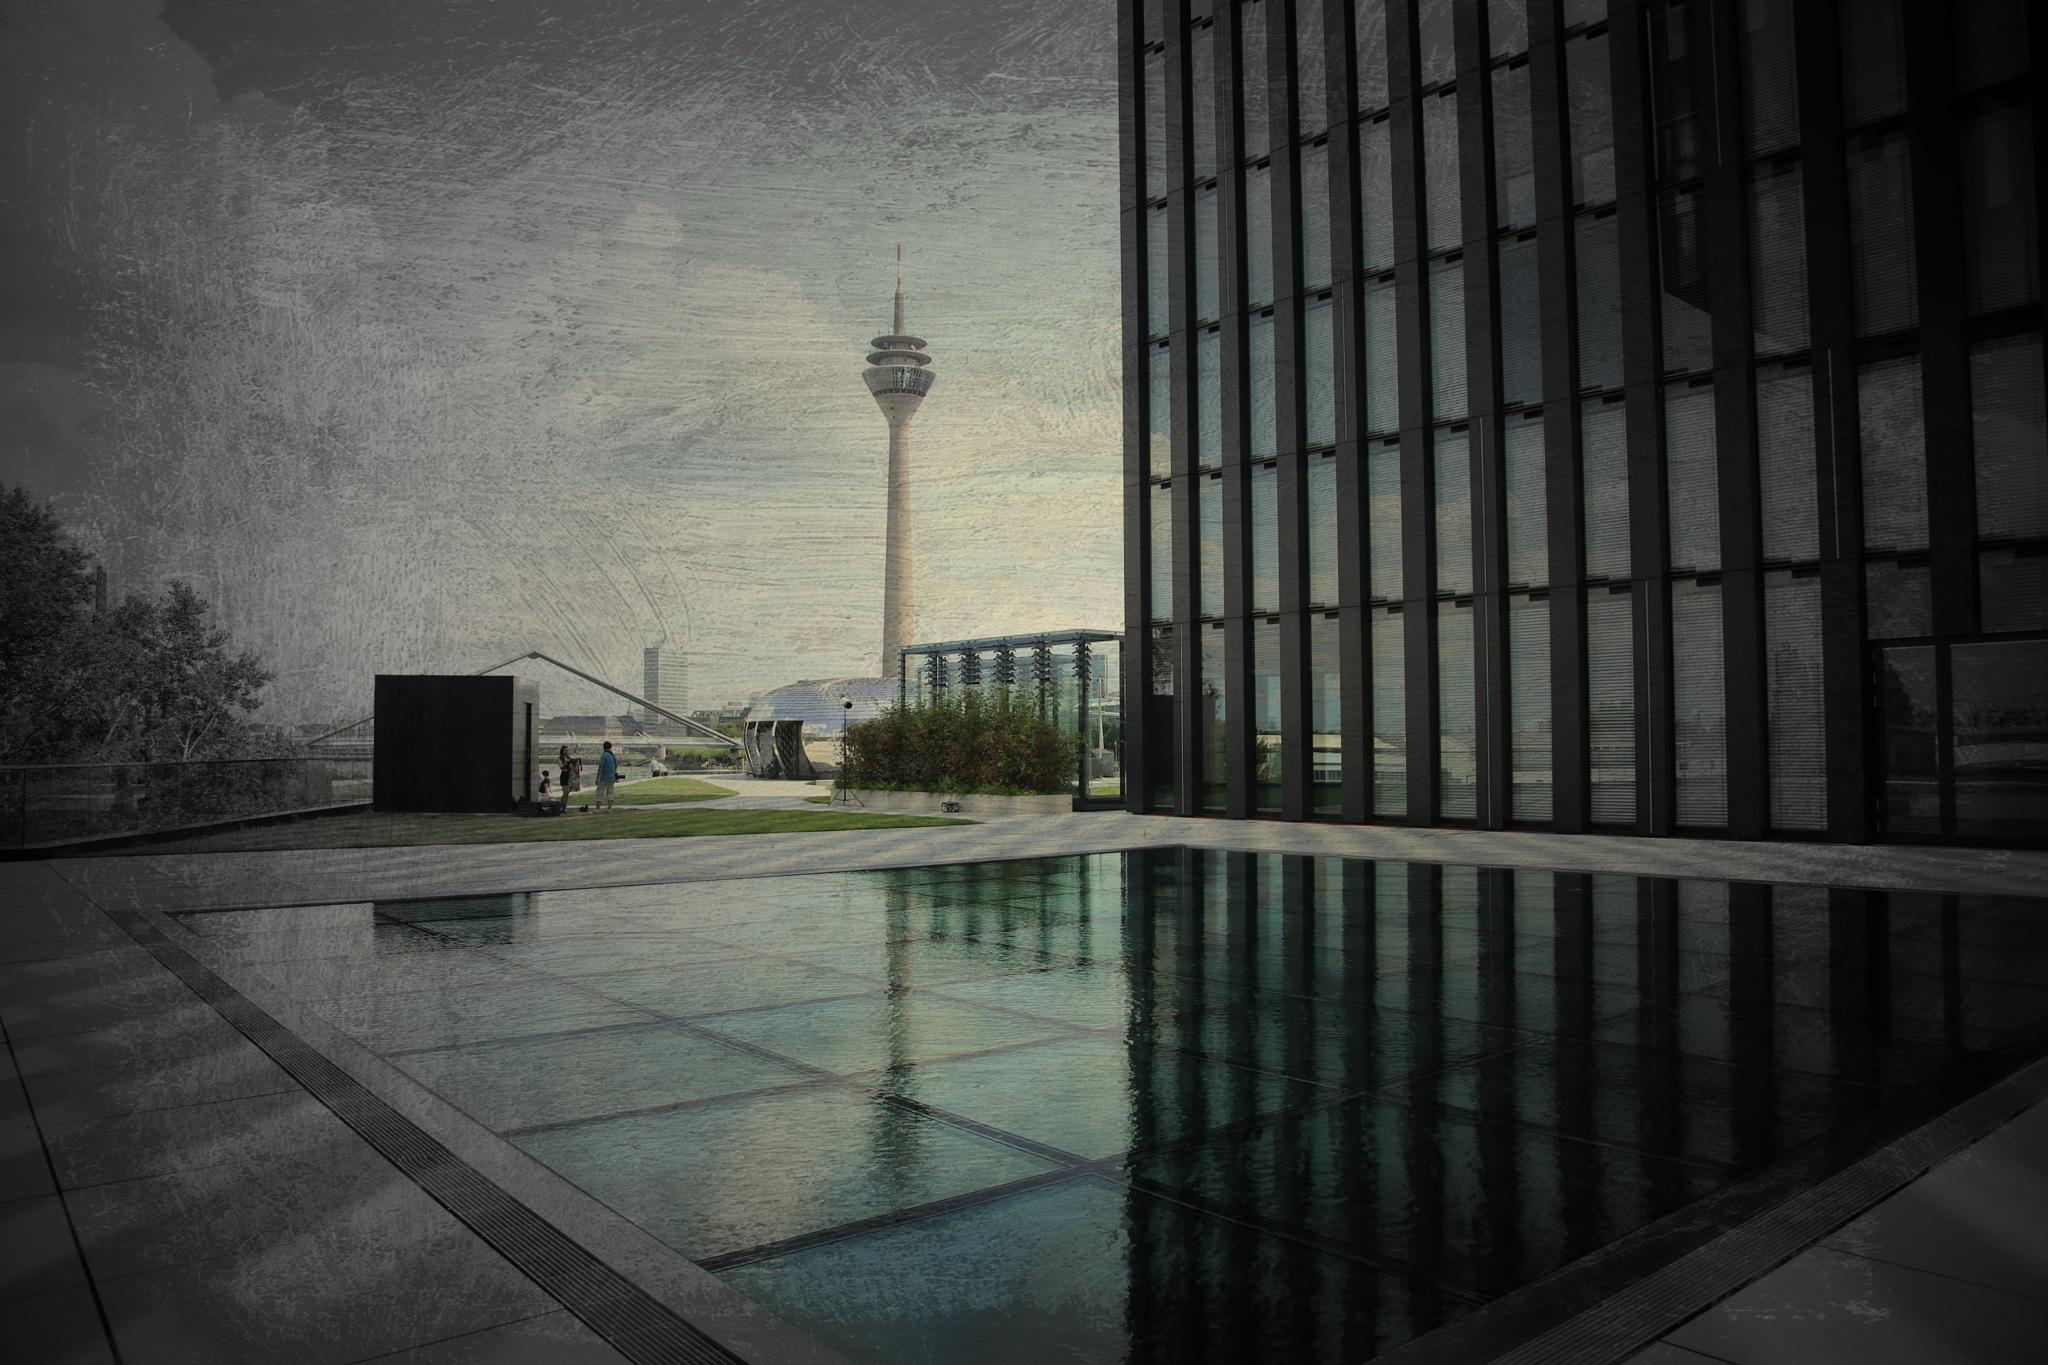 Dusseldorf TV tower. by marc.devriese